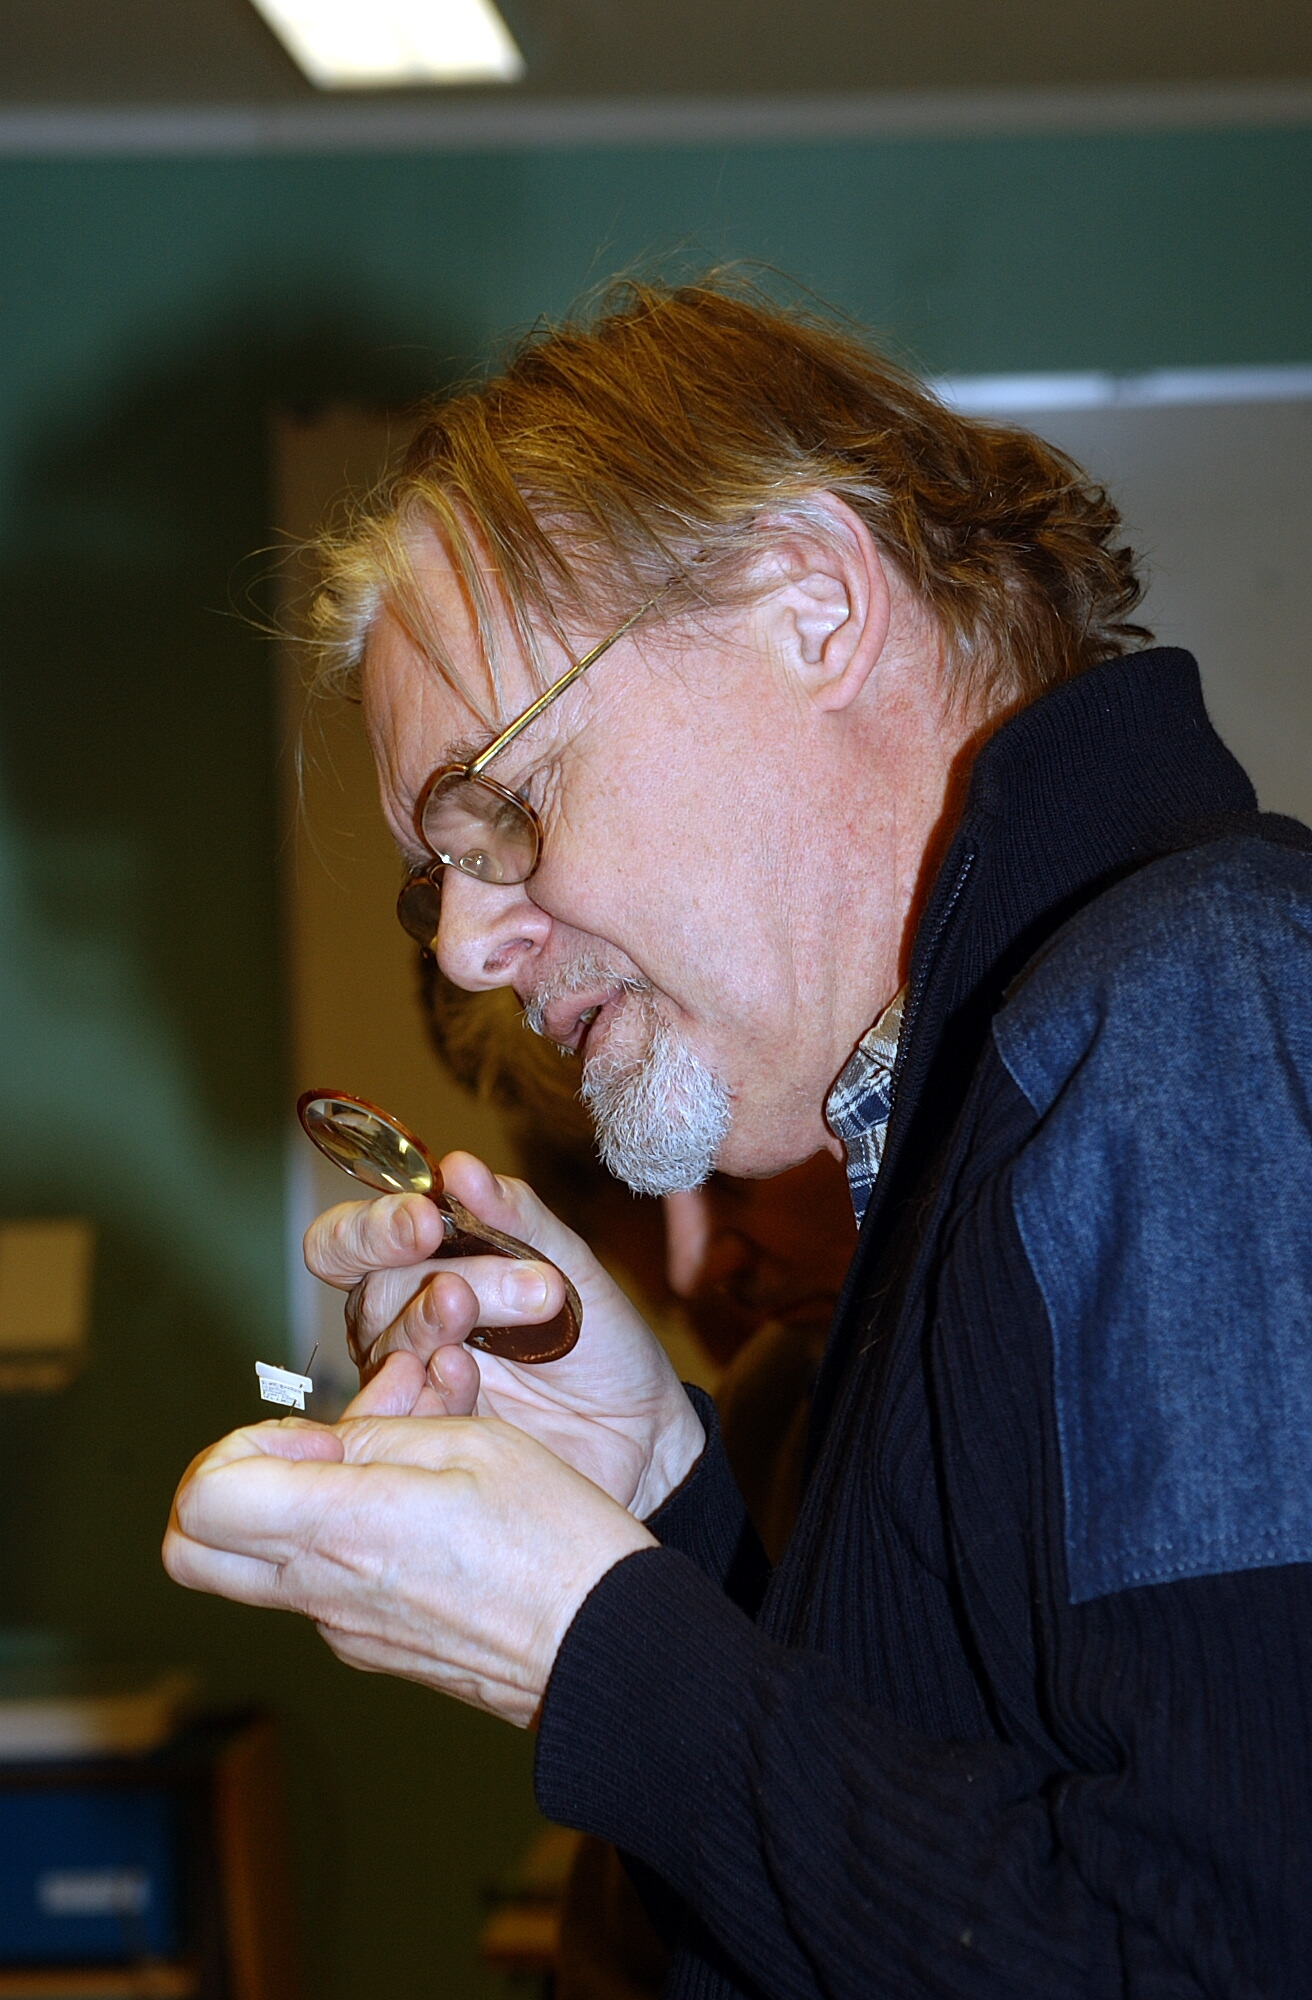 Peter Wärmling